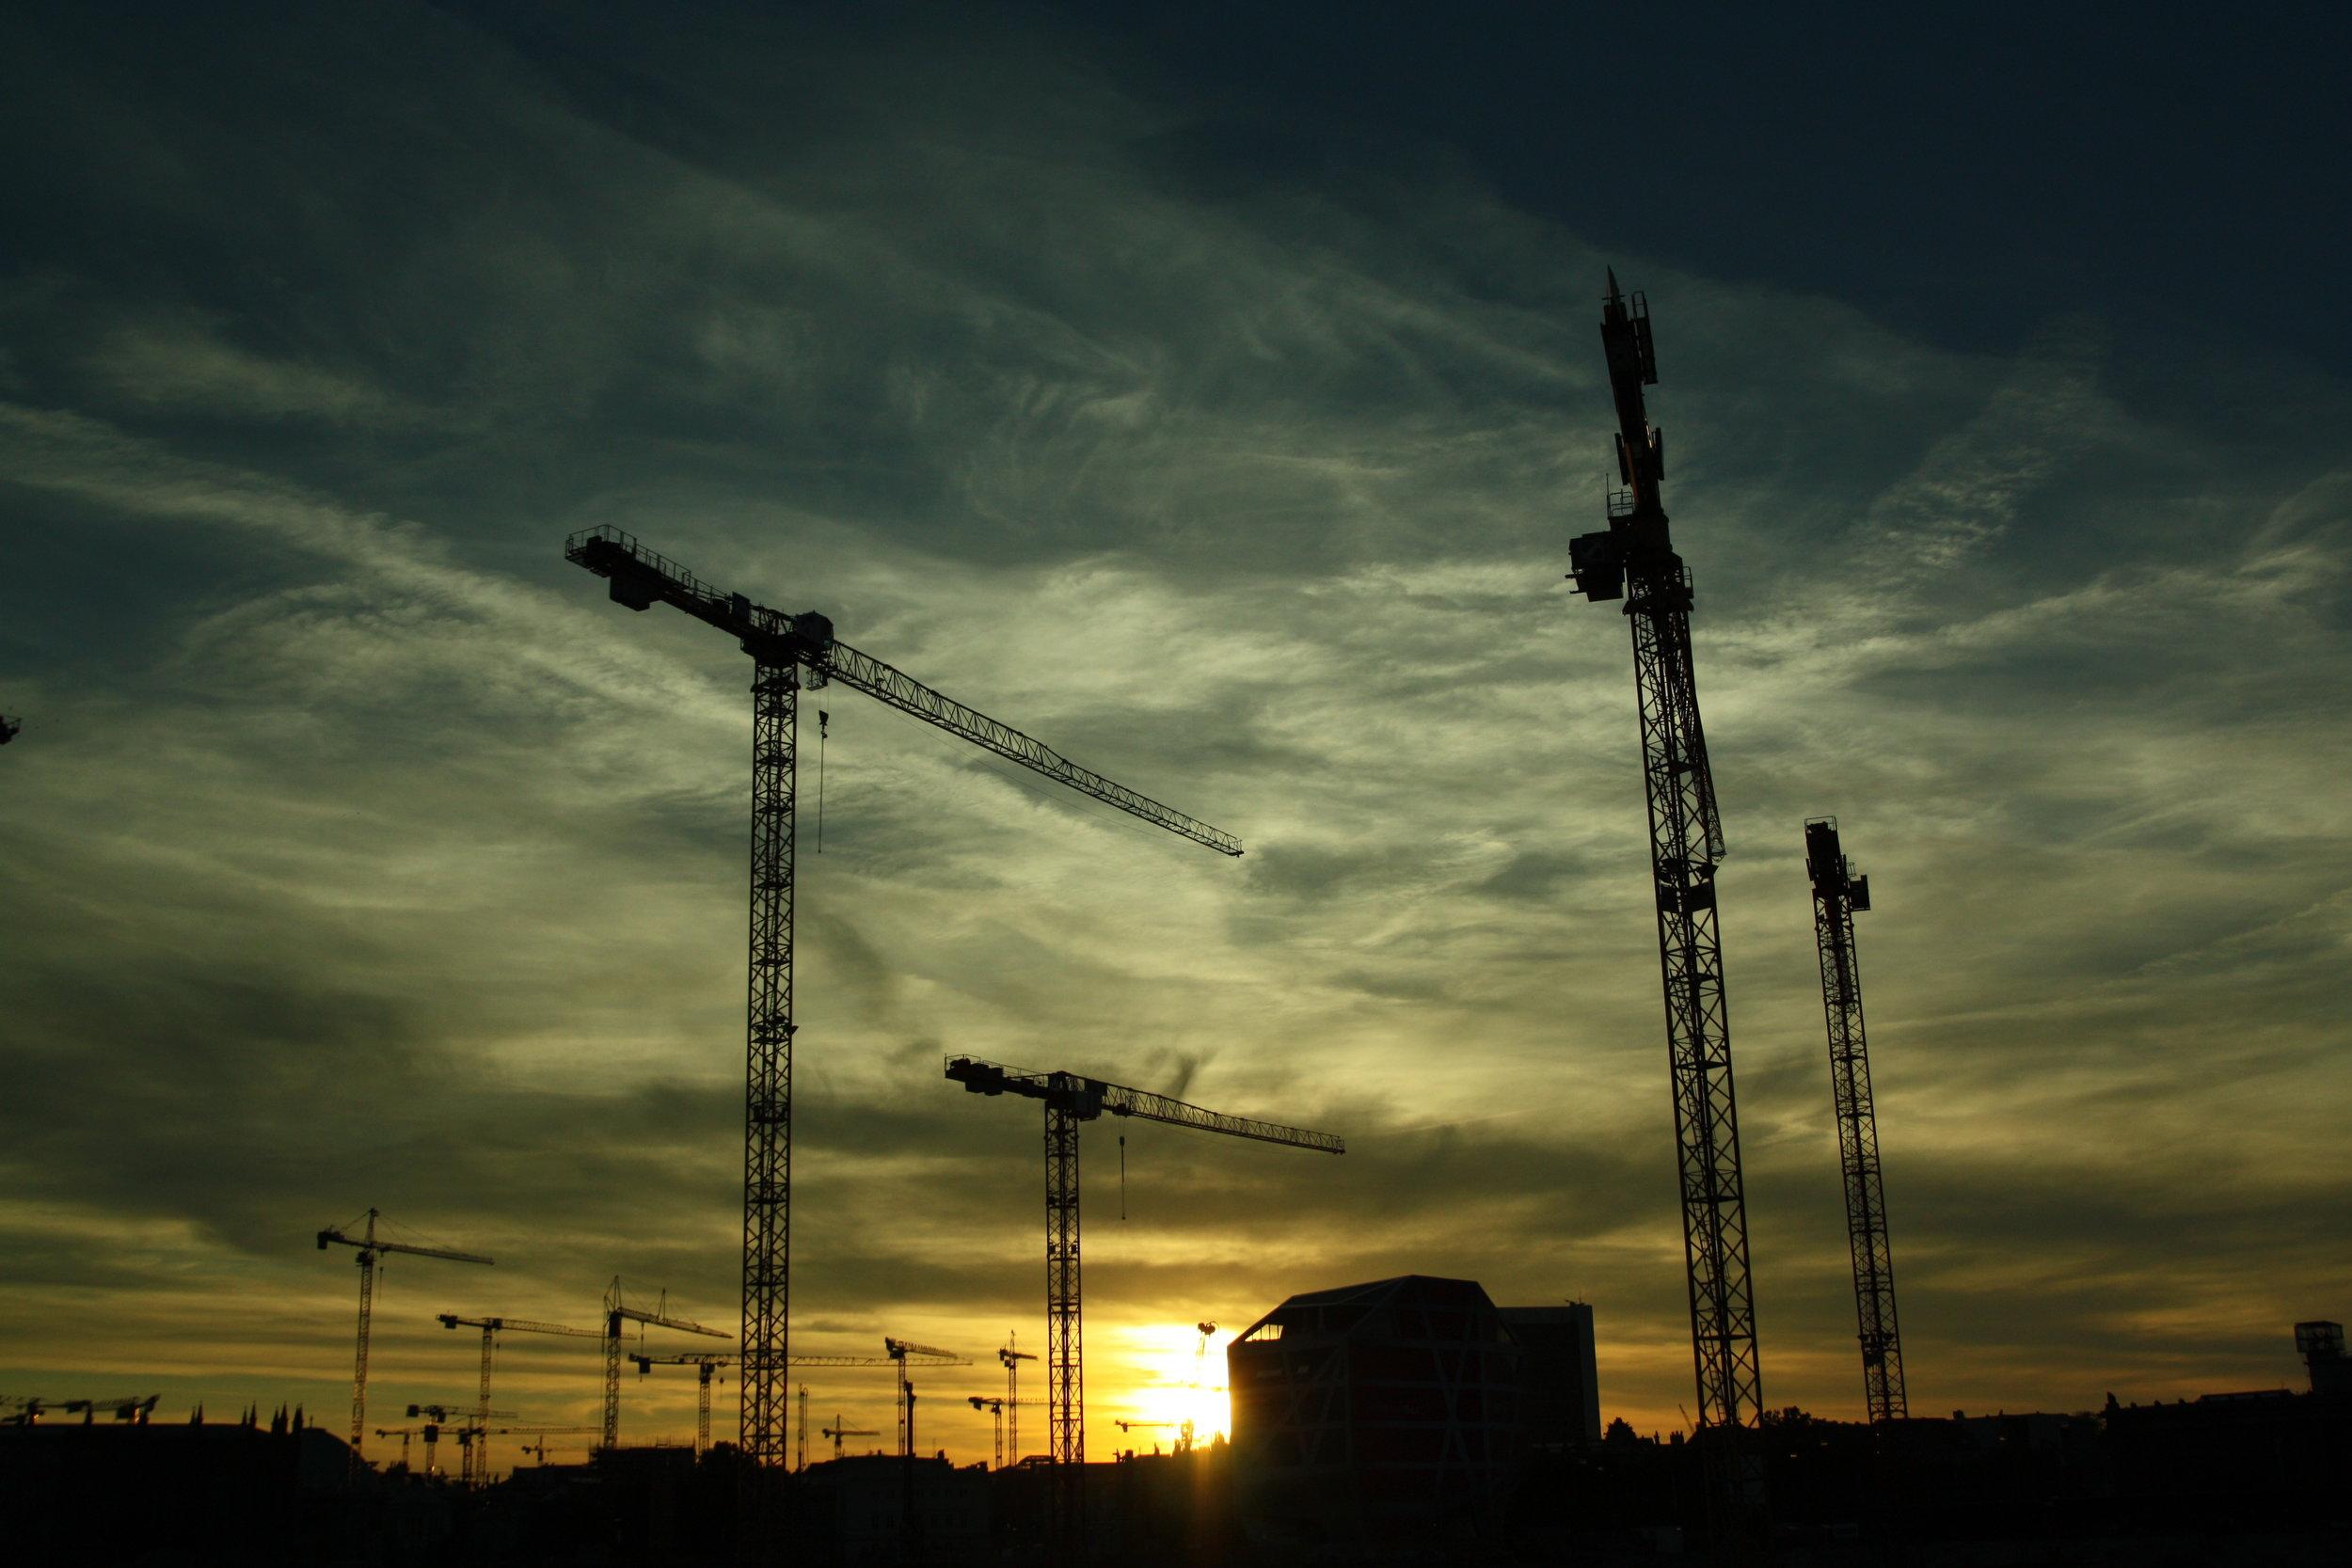 Construction -